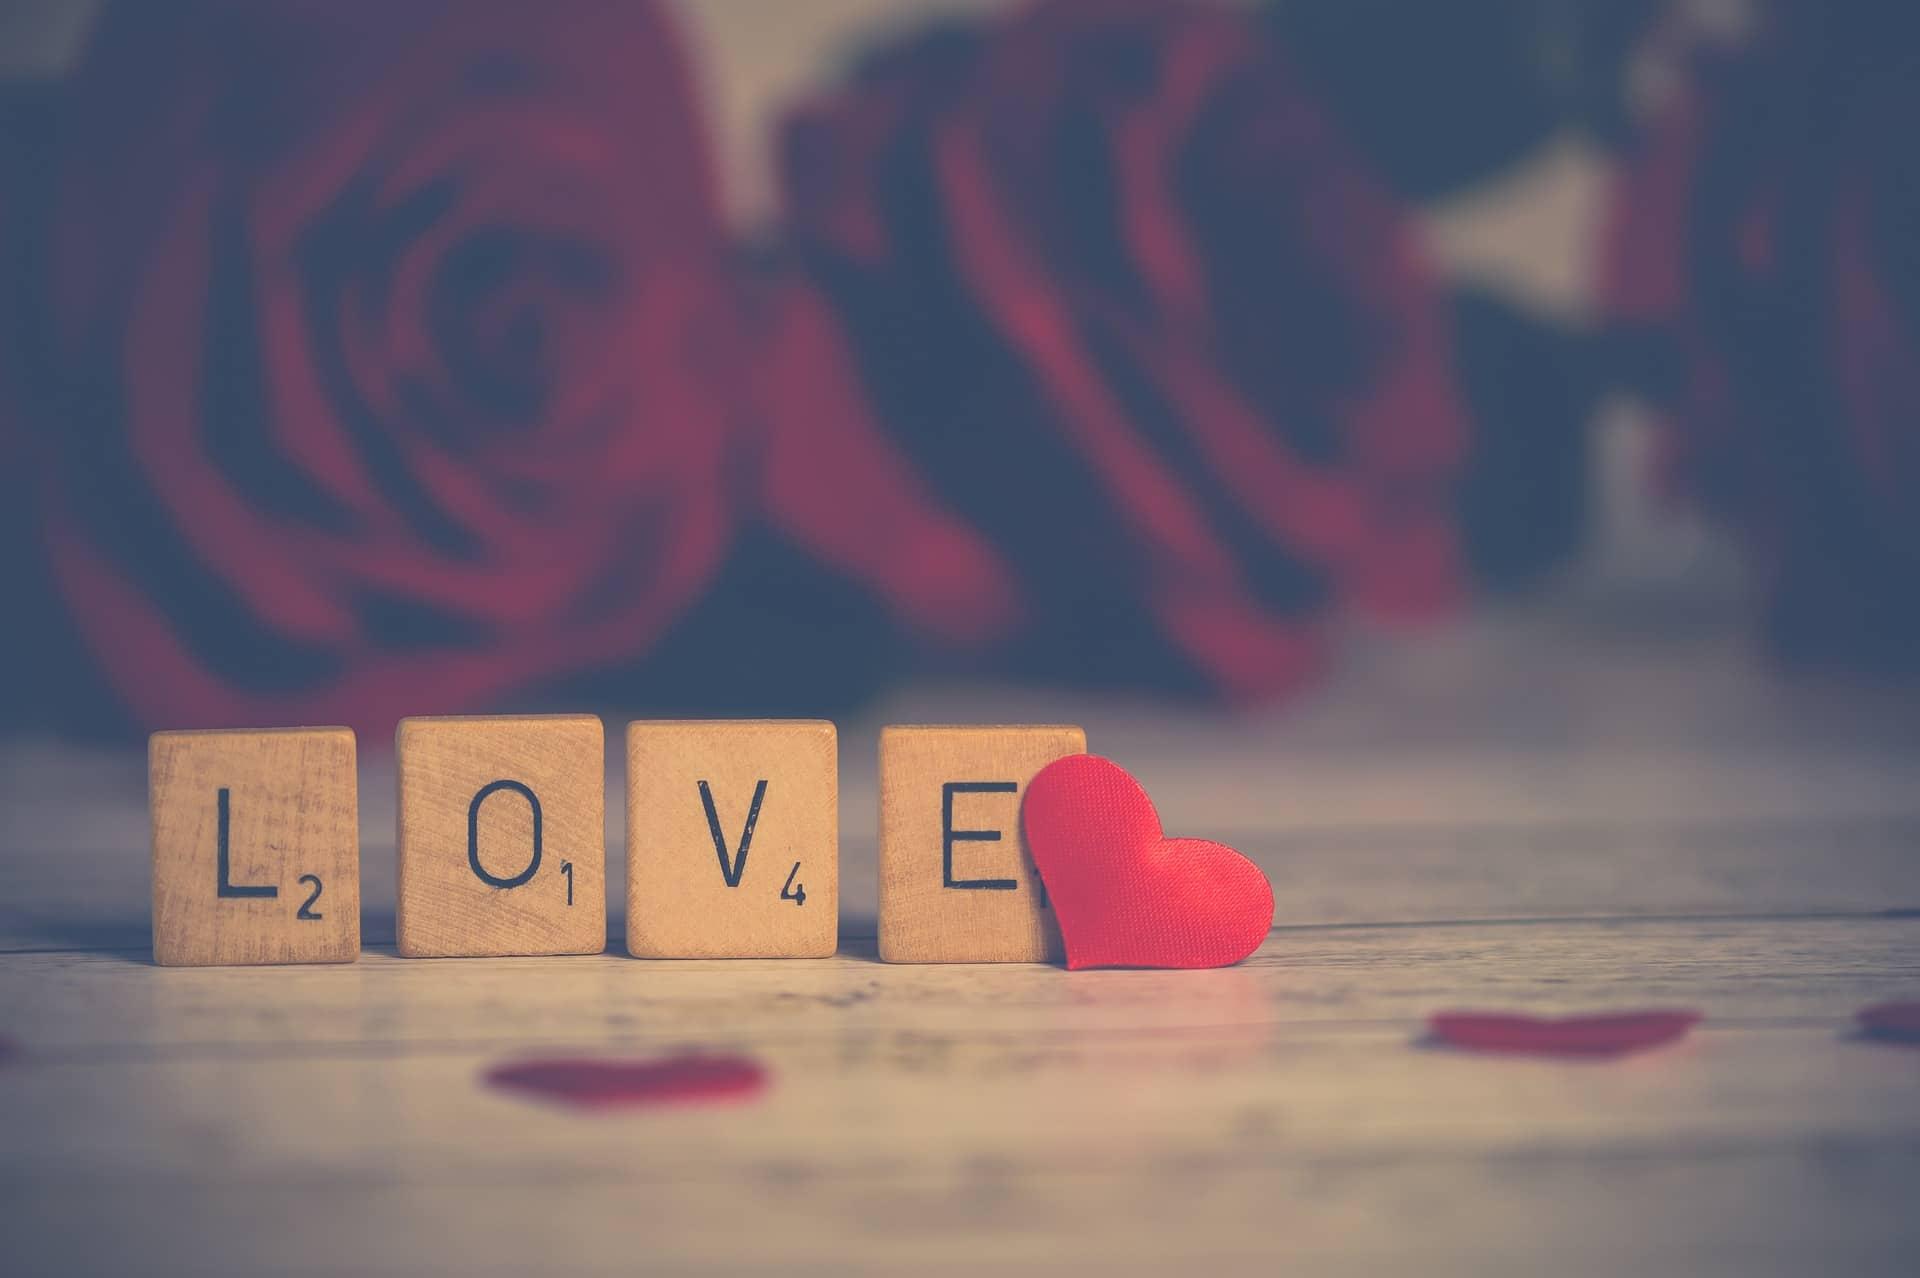 love-3061483_1920-1